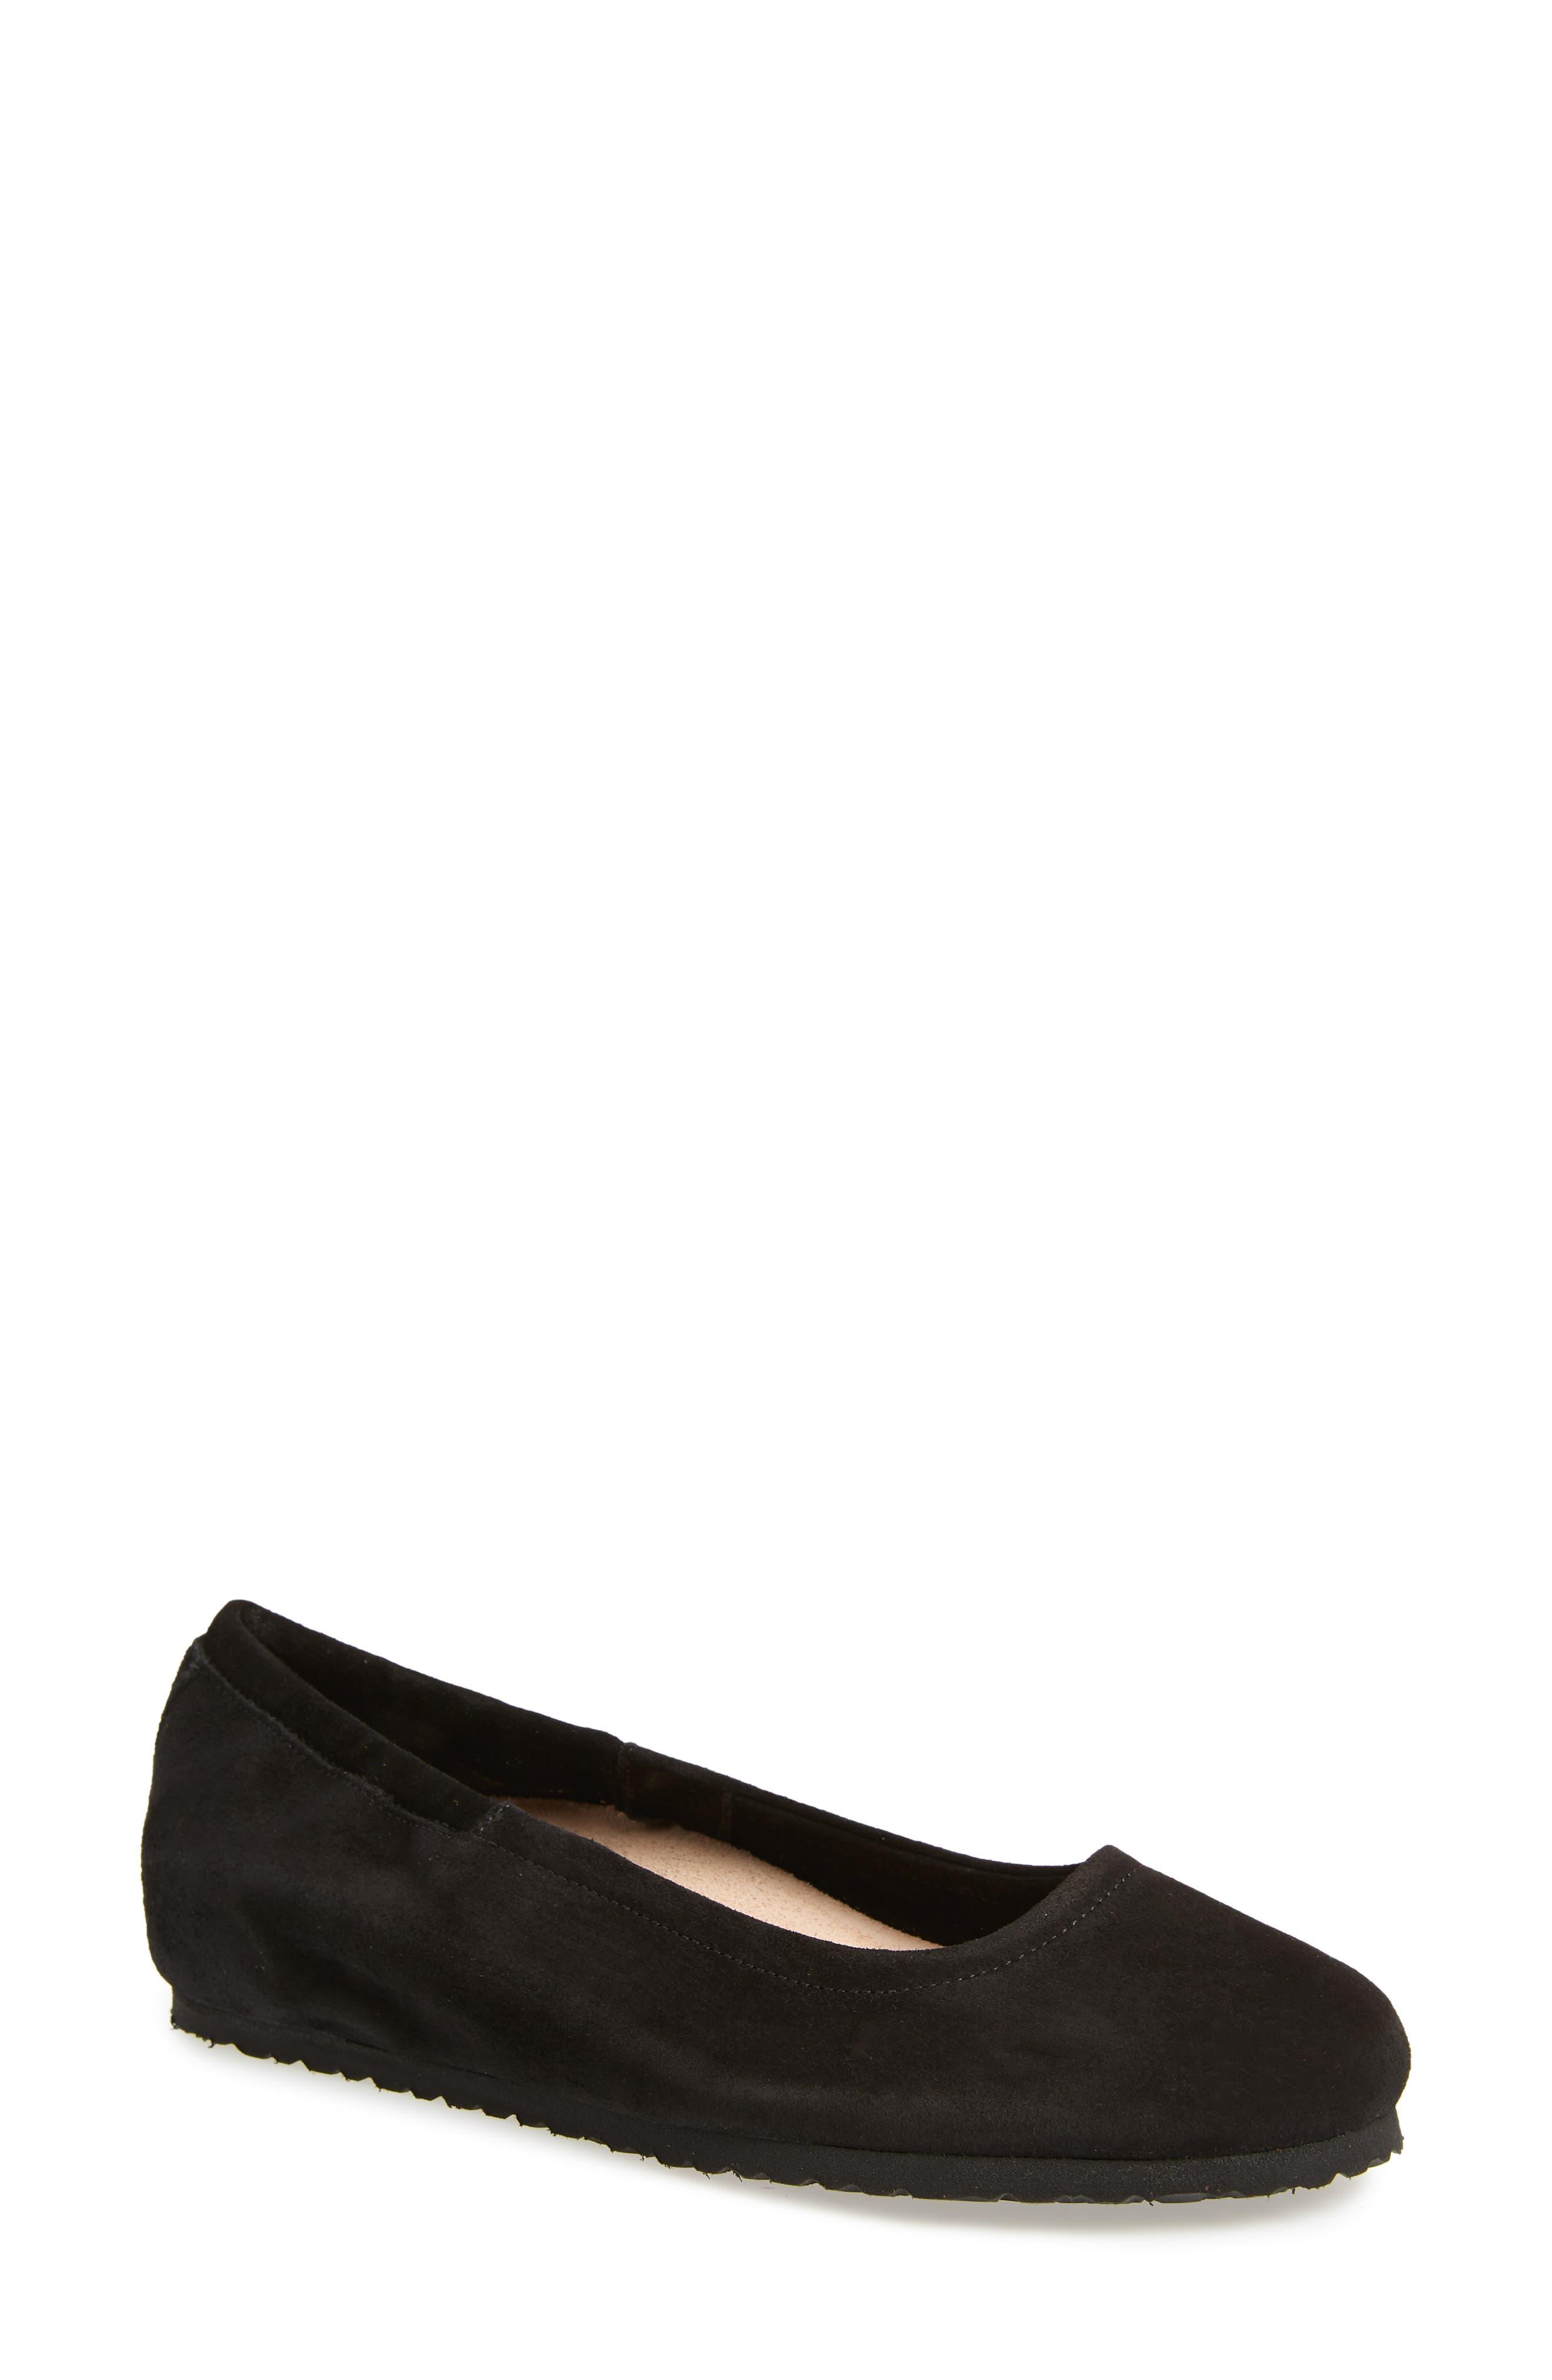 Celina Ballet Flat,                         Main,                         color, BLACK SUEDE